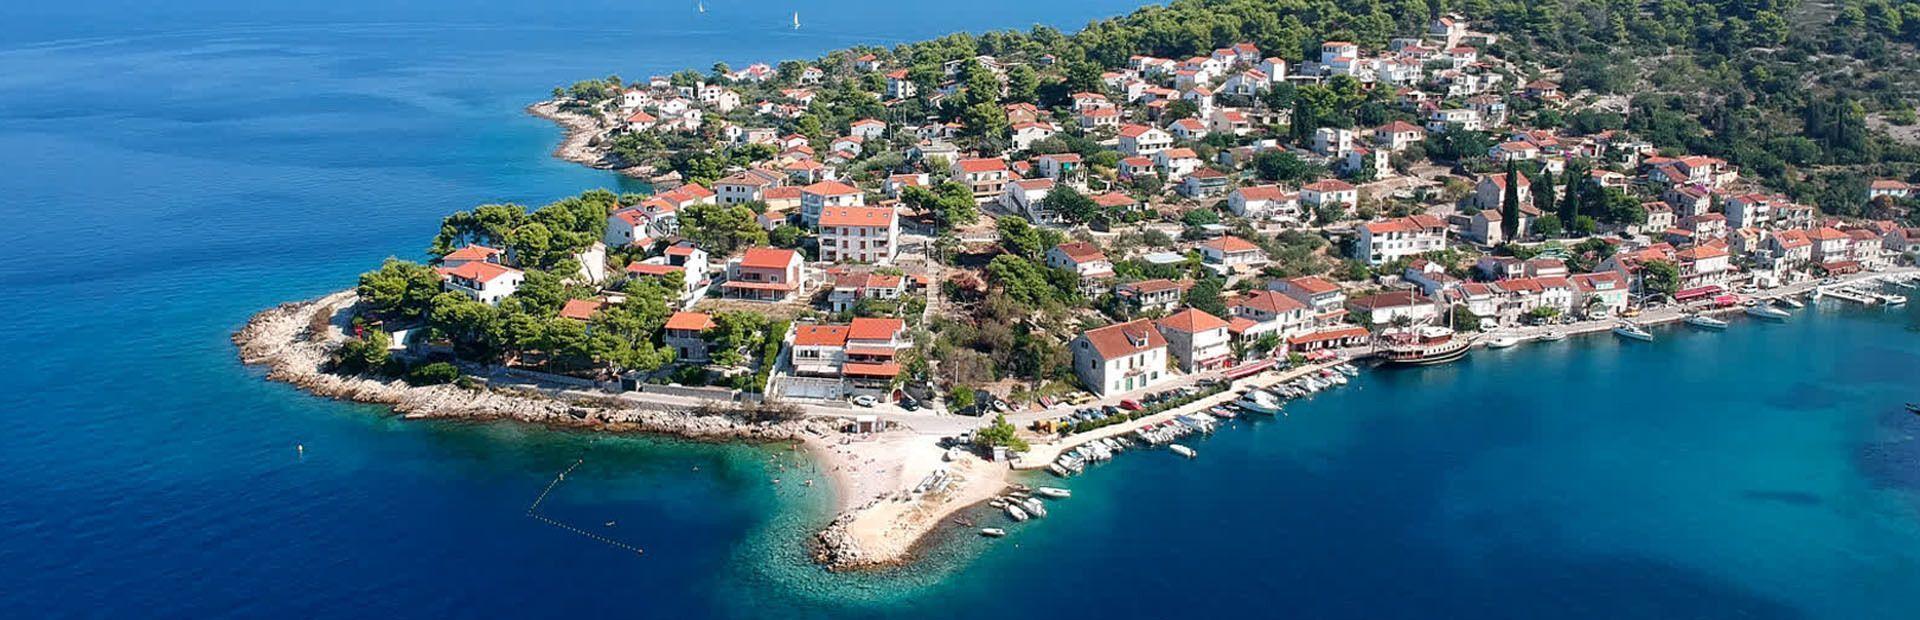 Croazia Sail Adventure